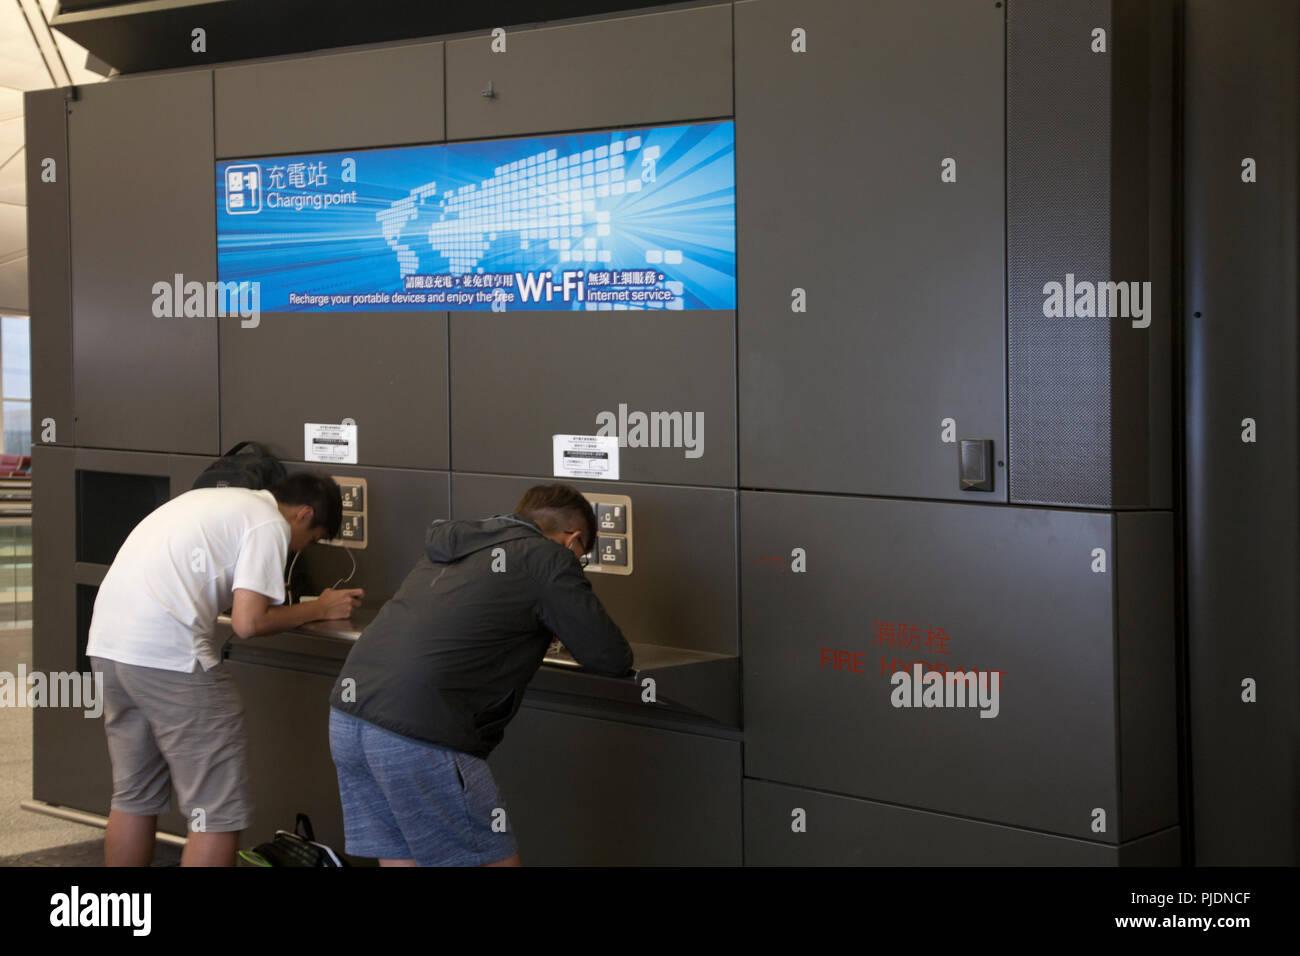 men using electronic devises at charging point terminal 1 hong kong international airport chek lap kok hong kong china - Stock Image